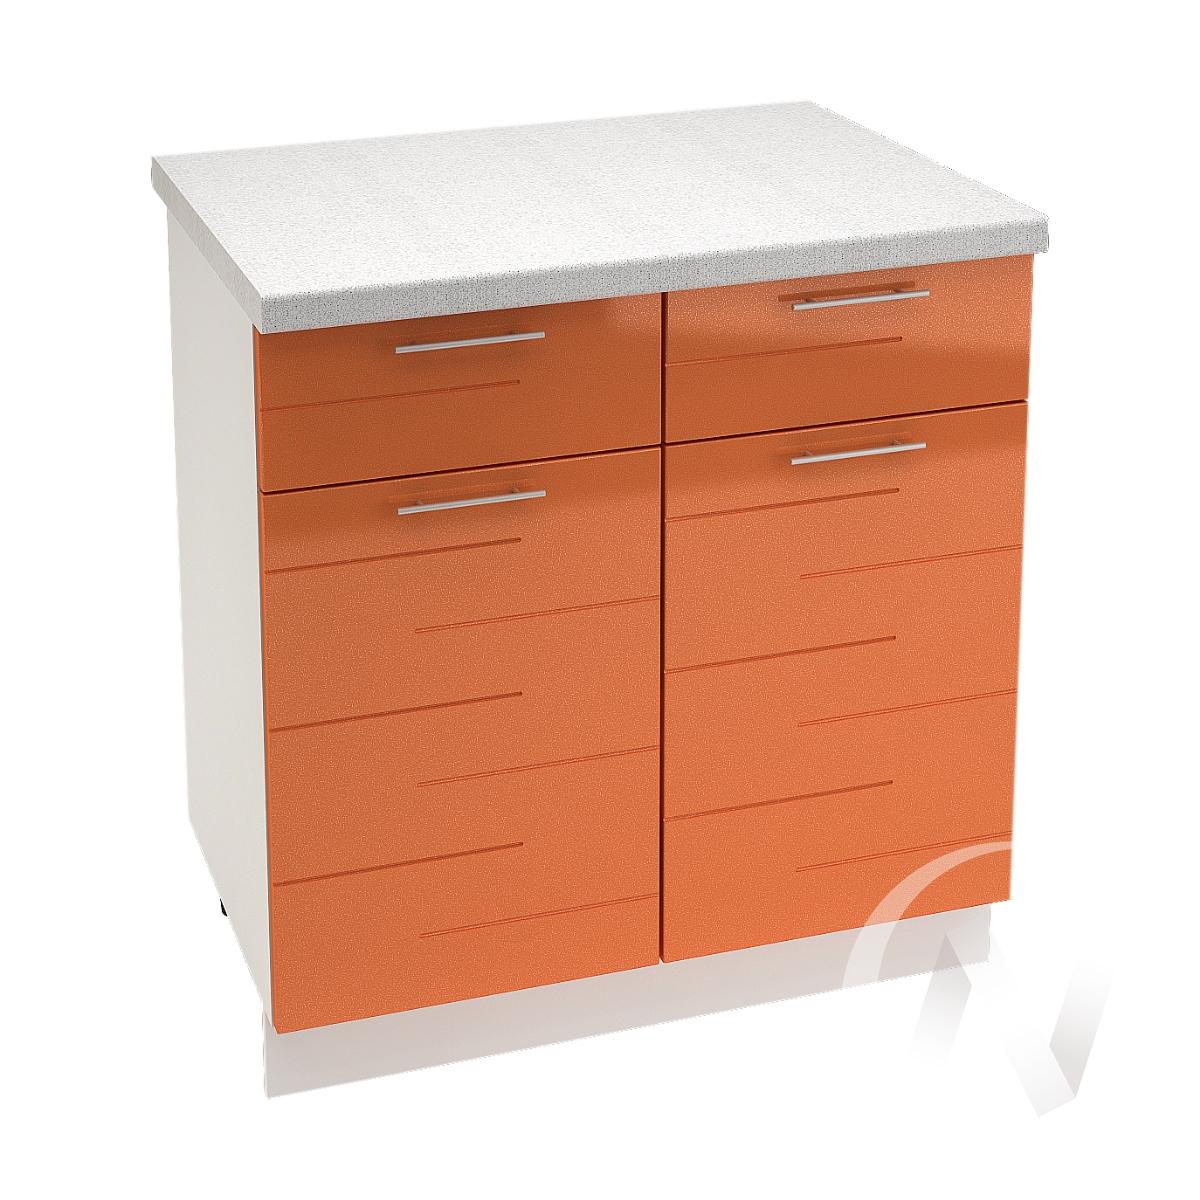 "Кухня ""Техно"": Шкаф нижний с ящиками 800, ШН1Я 800 (корпус белый)"